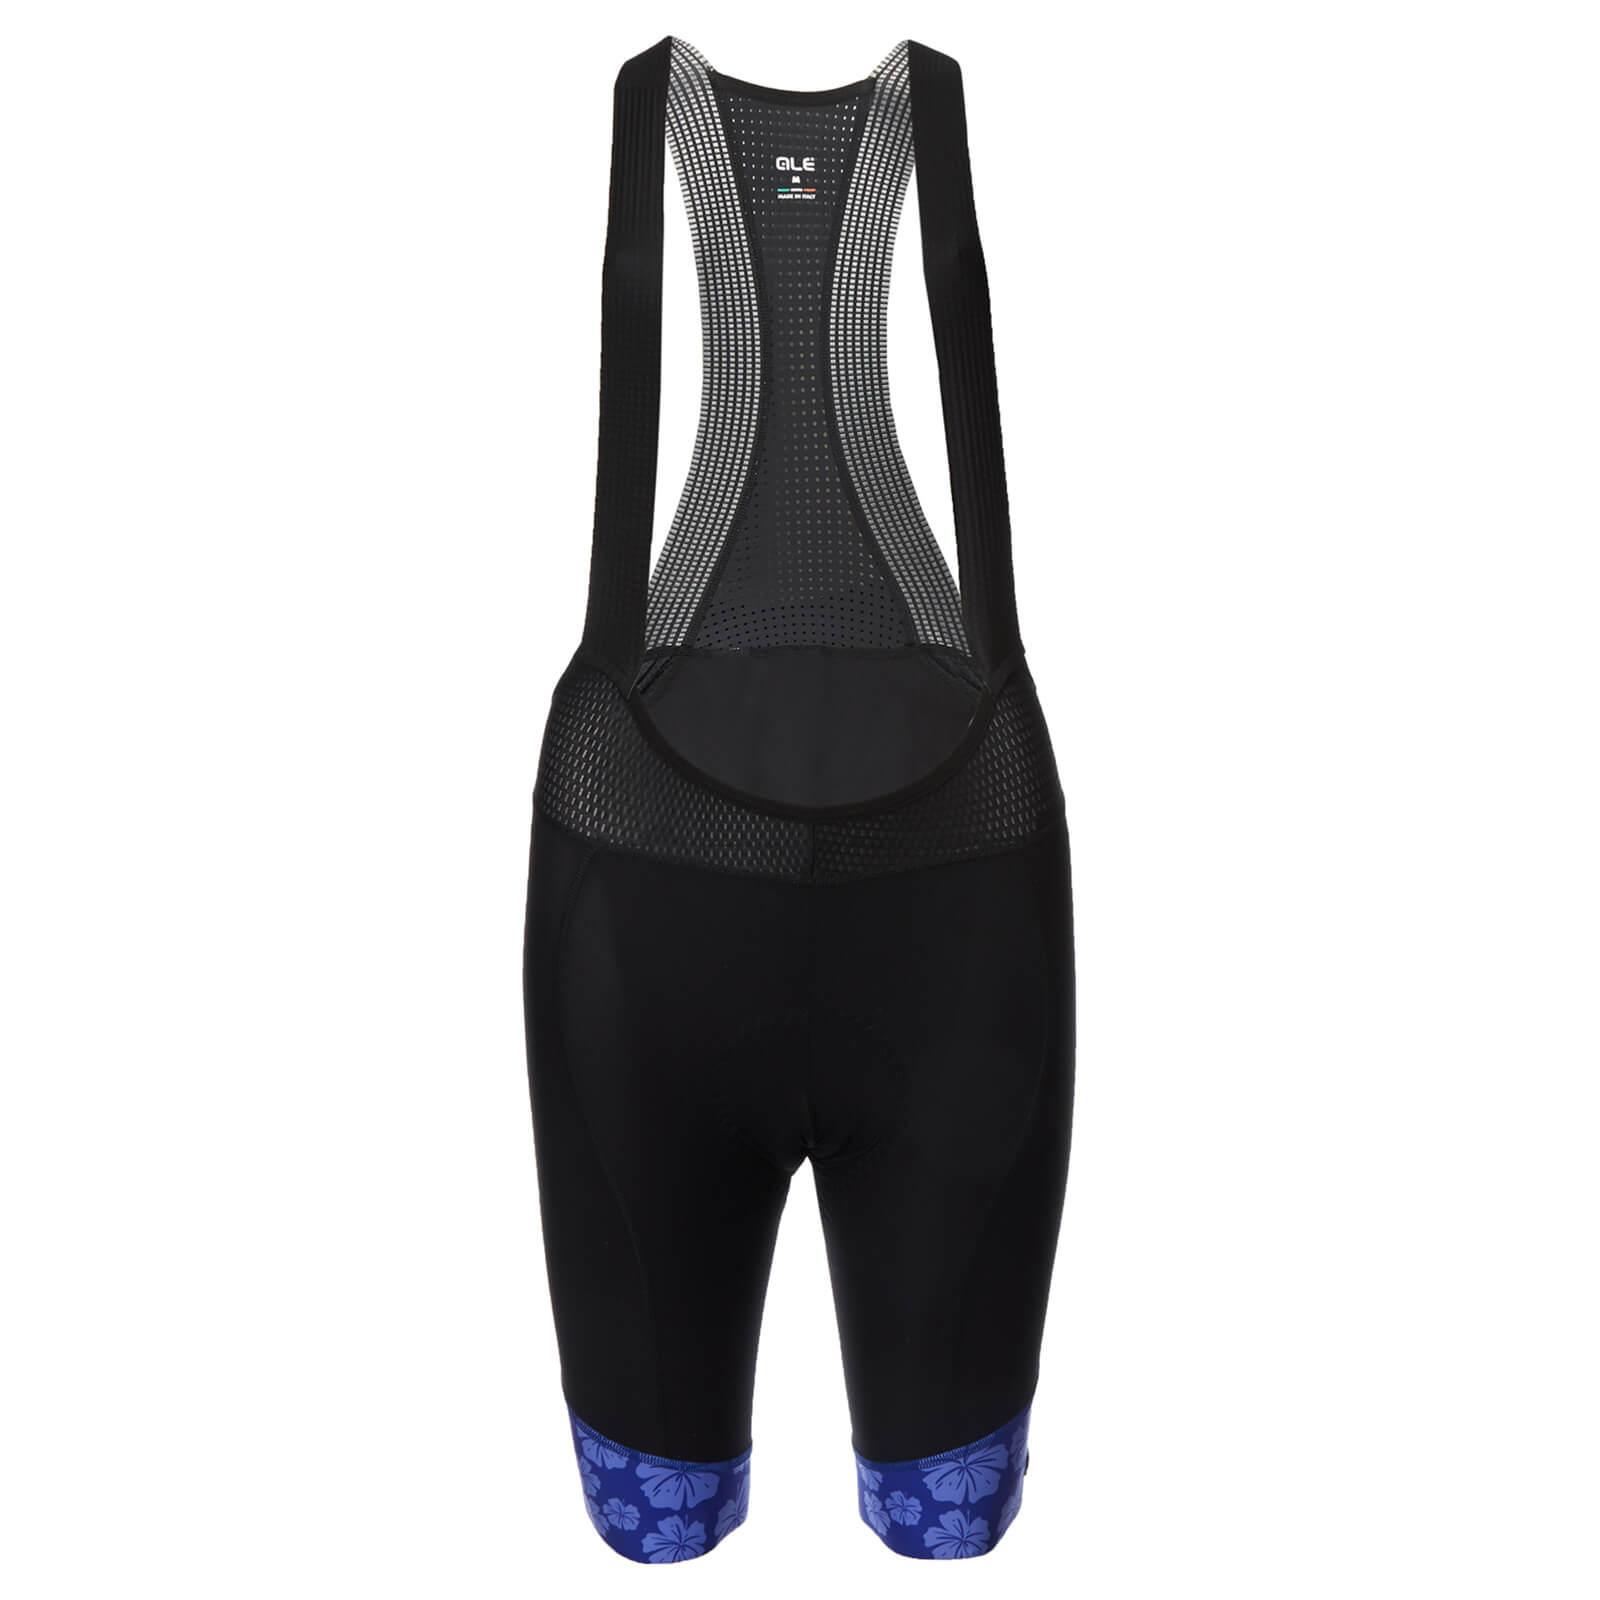 Alé Women's PRS Ibisco Bib Shorts - M - Pure Blue; female